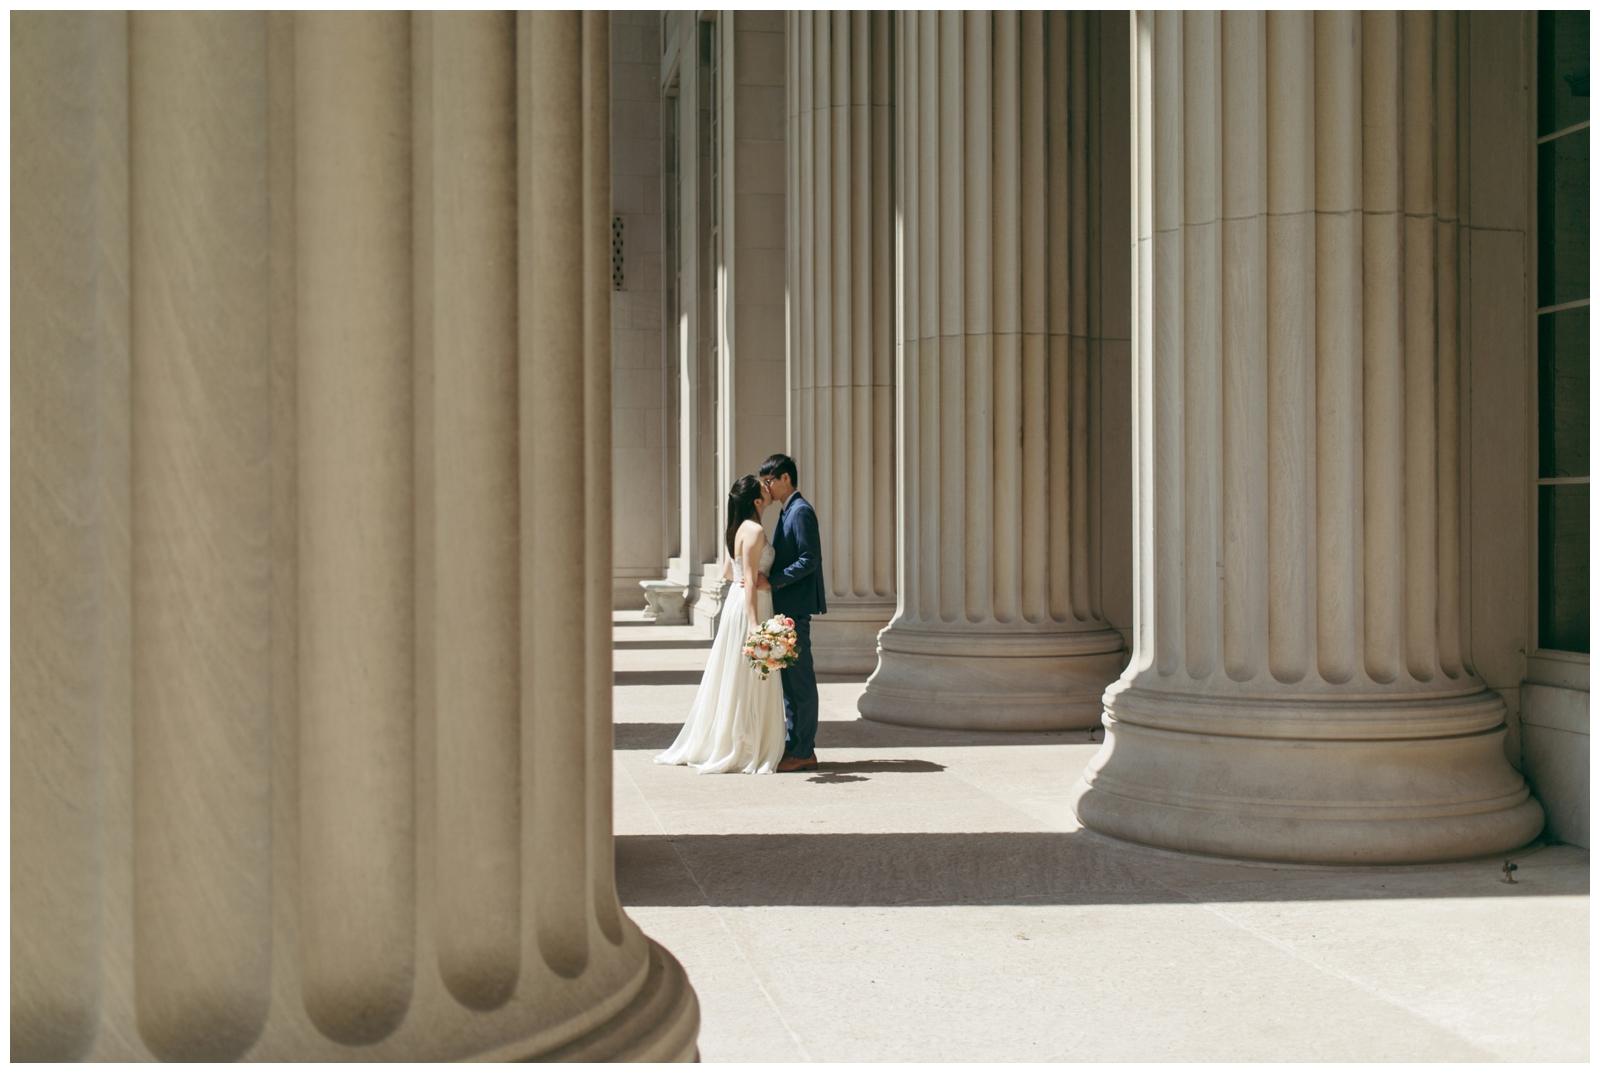 Samberg-Conference-Center-Boston-Wedding-Photographer-Bailey-Q-Photo-081.jpg